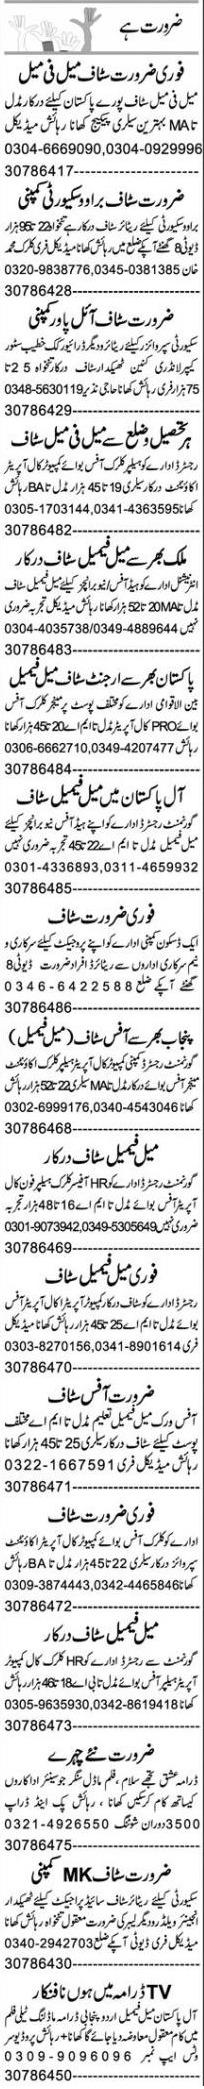 Daily Express Management Staff Jobs 2021 in Faisalabad